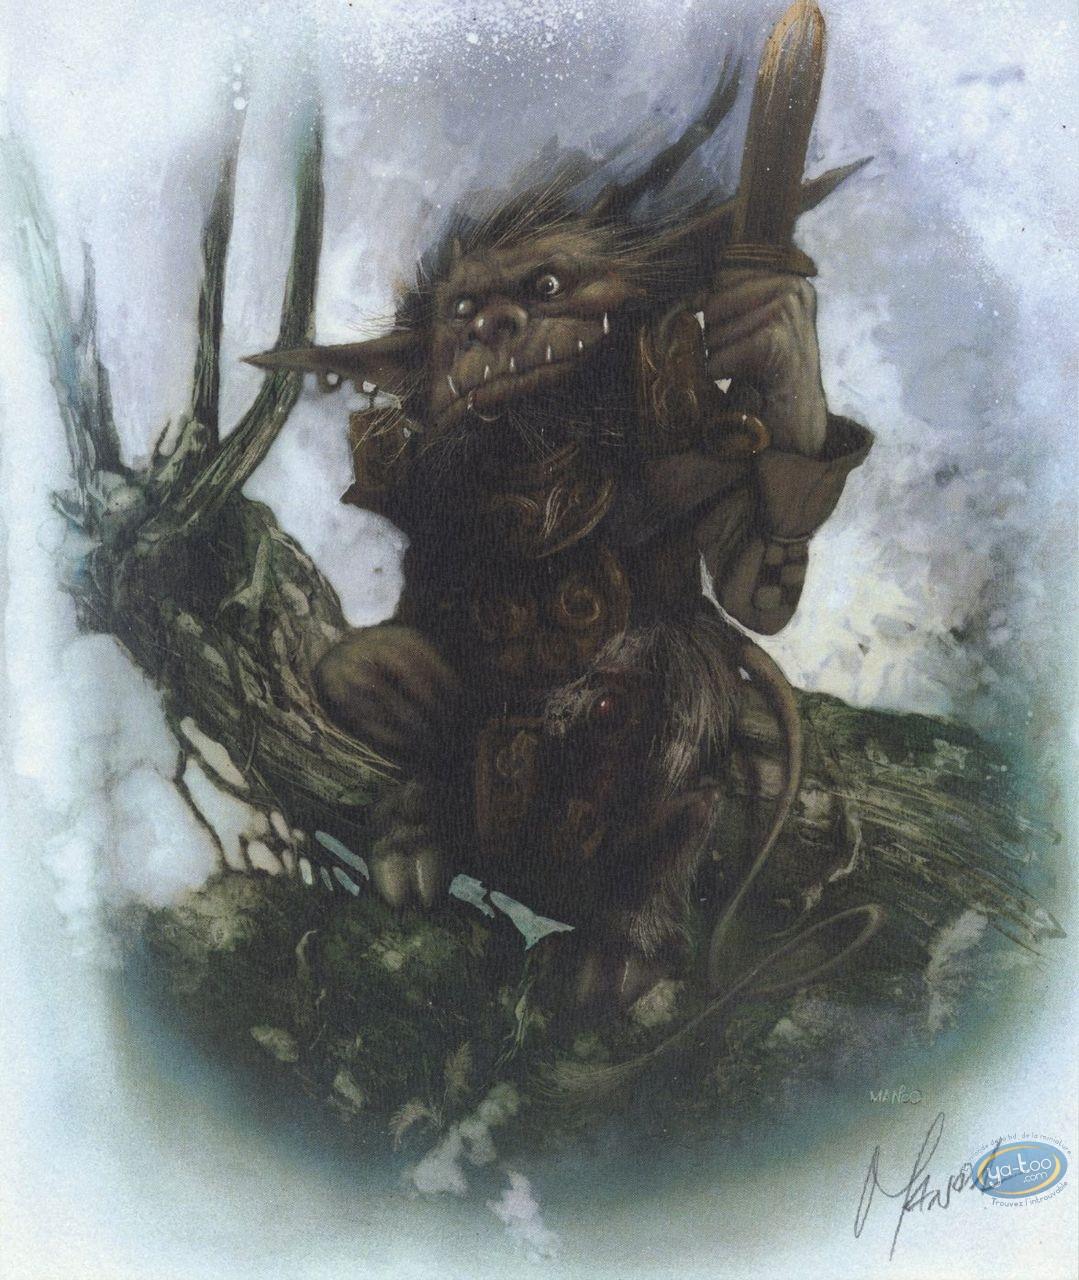 Bookplate Offset, Graine de Folie (La) : Gnome